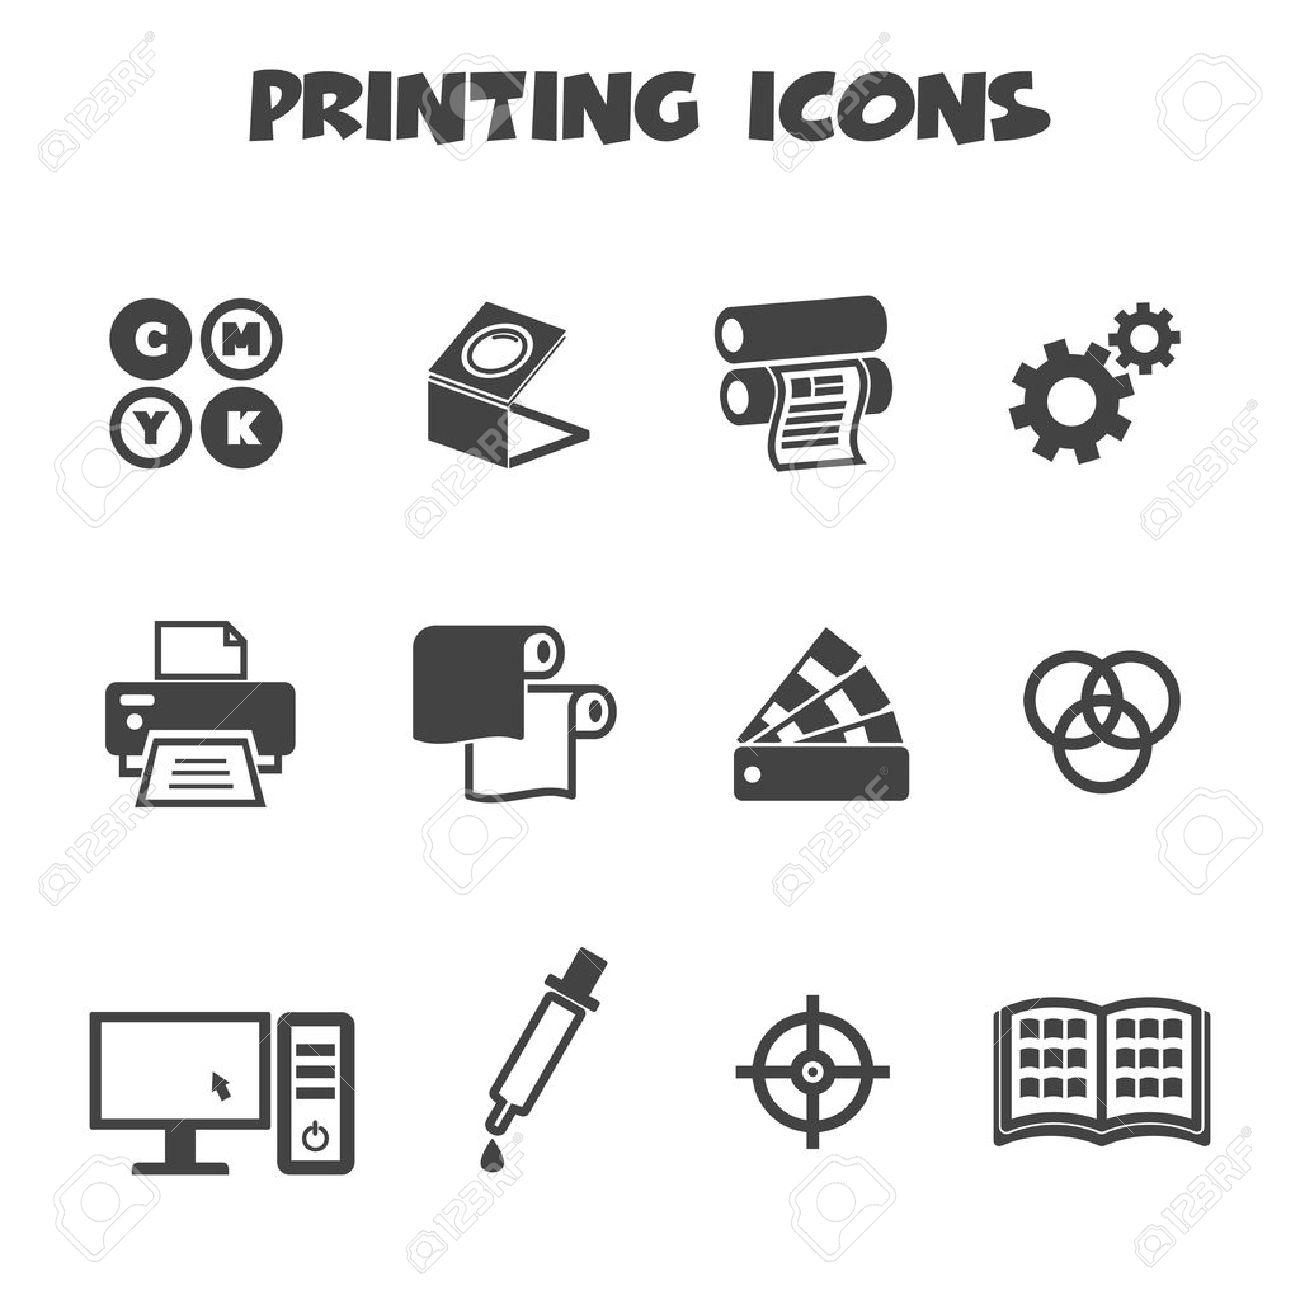 printing icons, mono vector symbols - 27374152